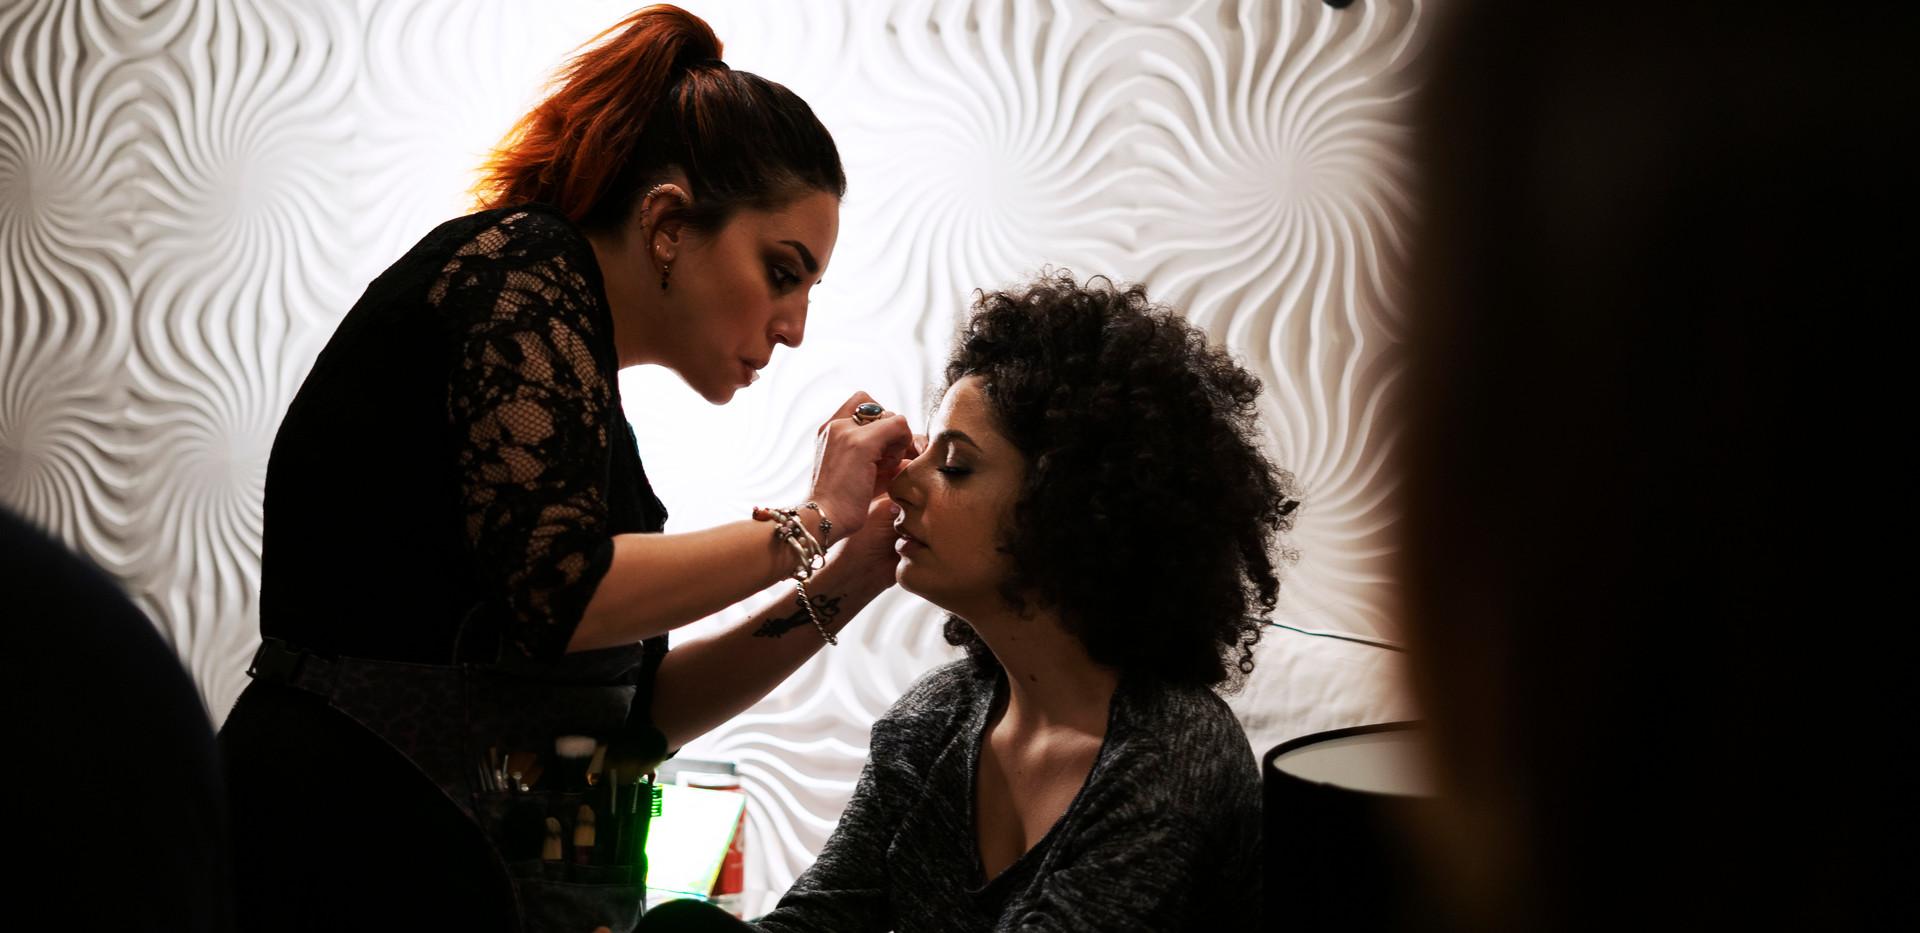 Jael Stribny & Adi Dror